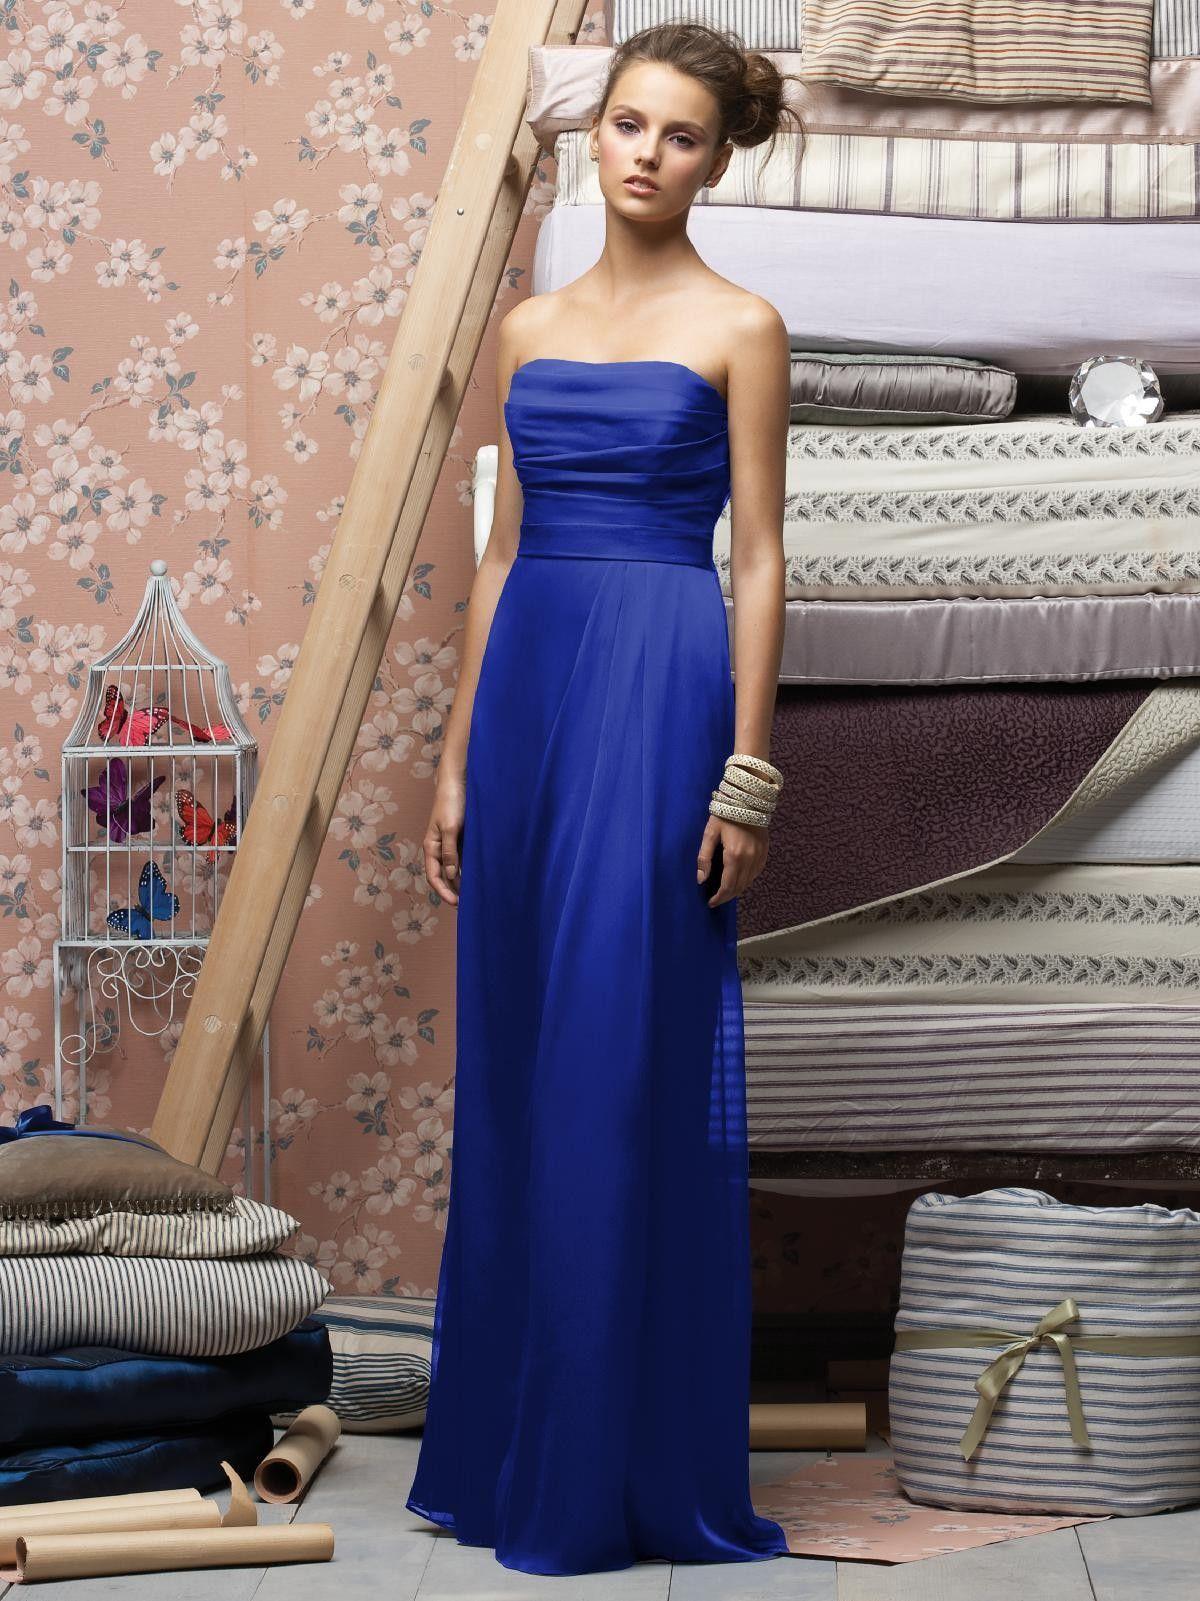 Blue grey wedding dress  Royal blue bridesmaid dress wow so striking They can be my